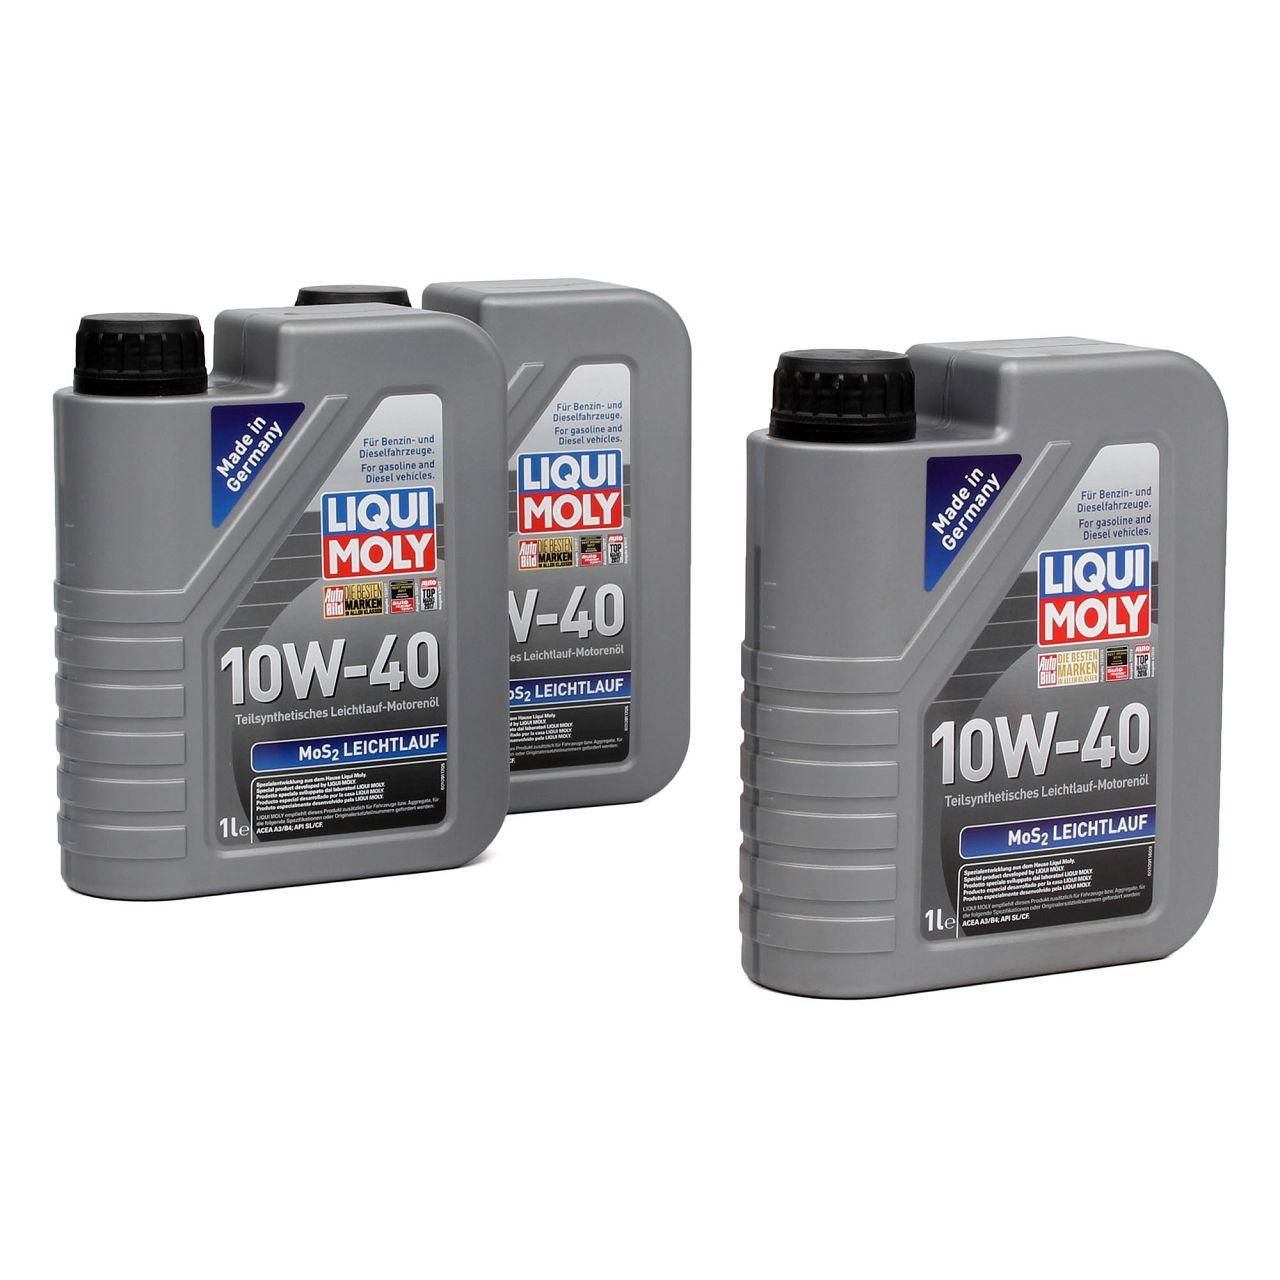 LIQUI MOLY Motoröl Öl MoS2 LEICHTLAUF 10W40 10W-40 3L 3Liter 1091